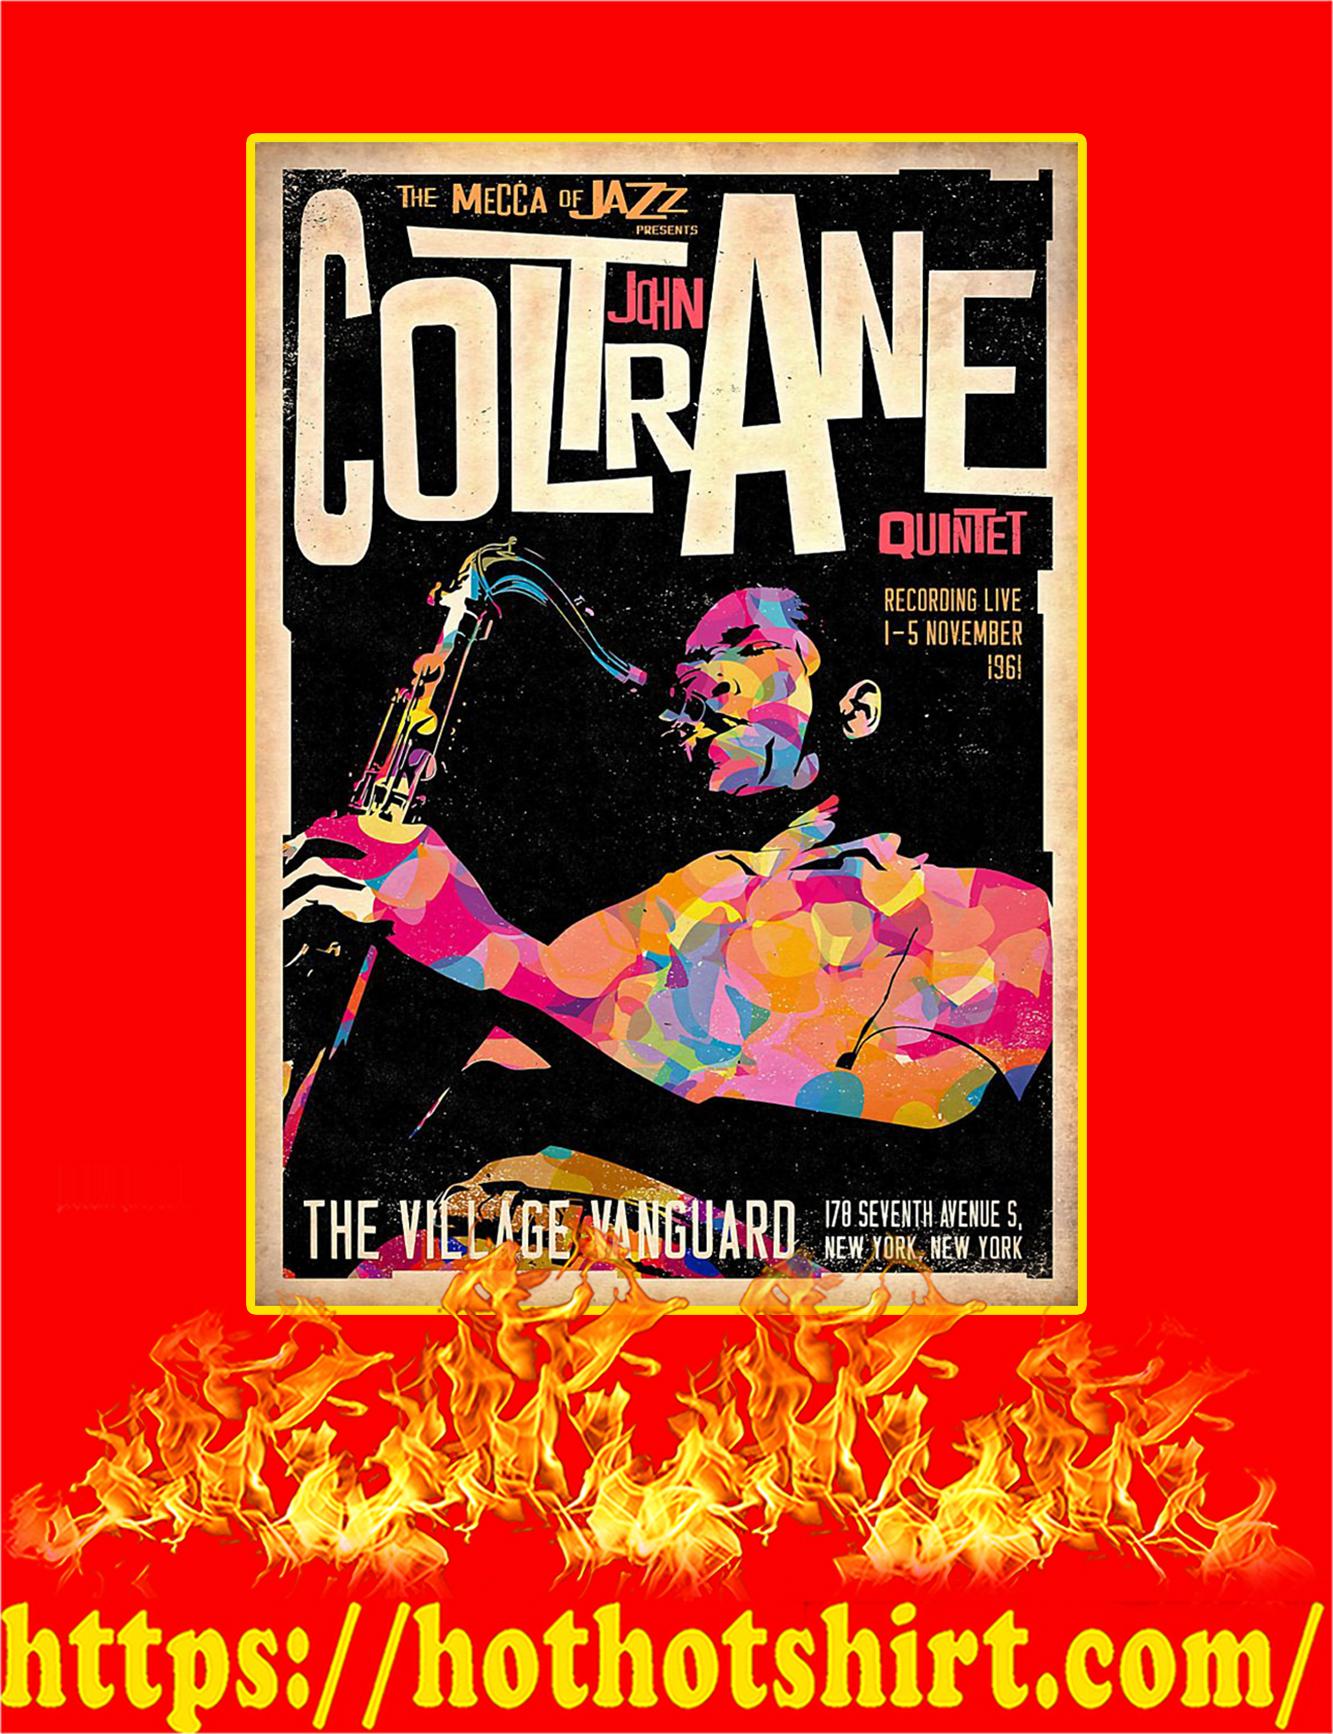 John Coltrane Quintet Poster - A4